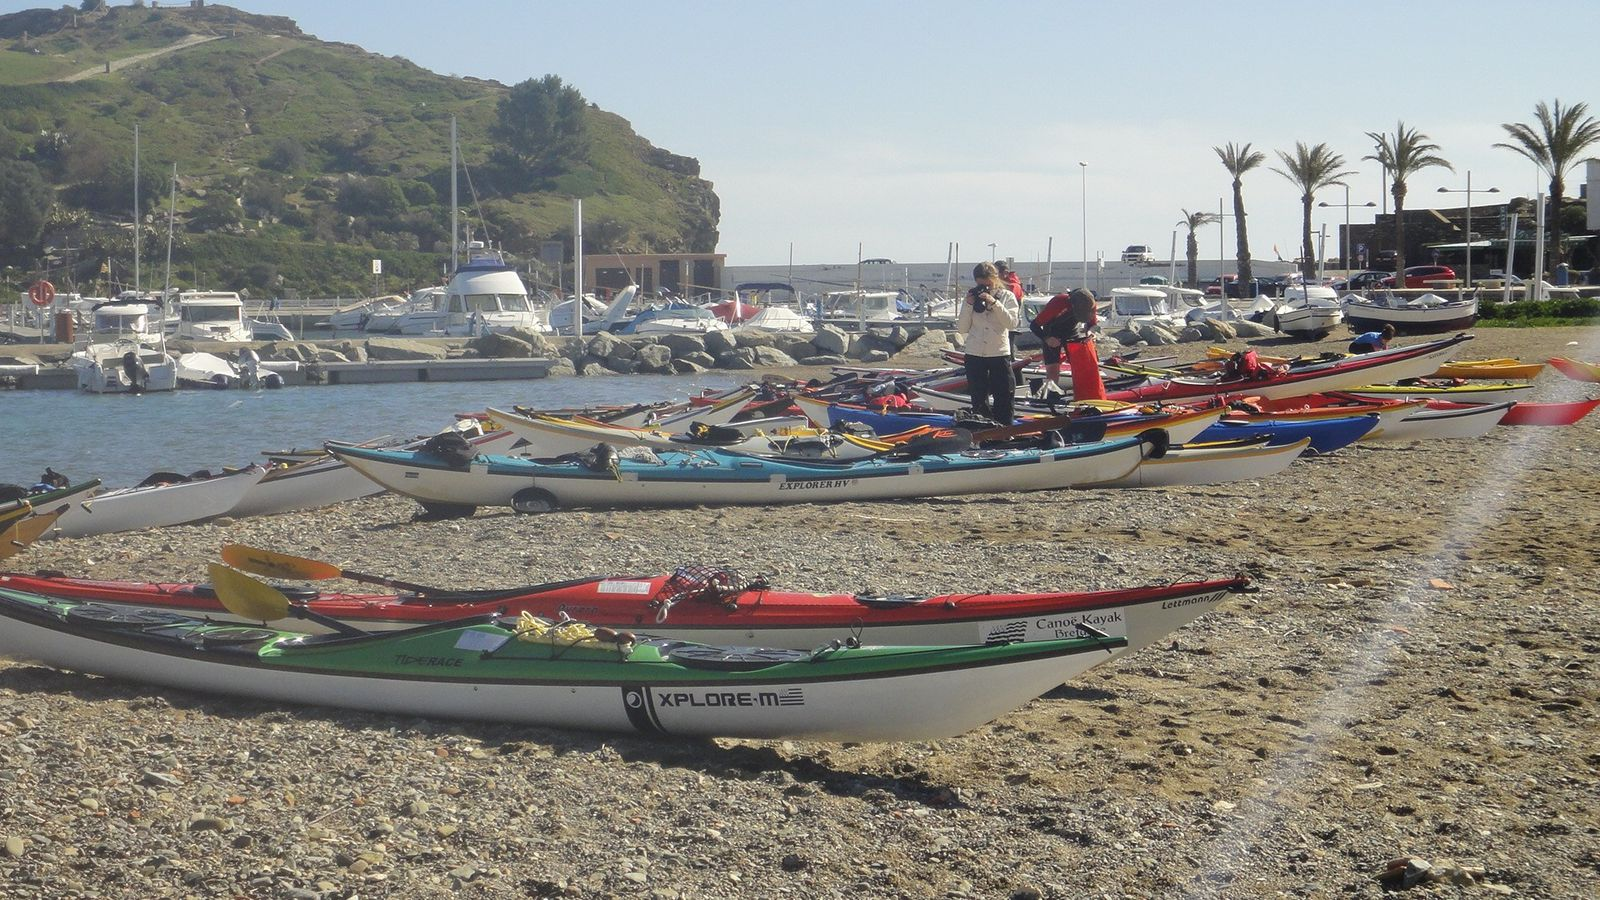 Symposium international de kayak de mer - Llança - Espagne - 23 au 25 mars 2013